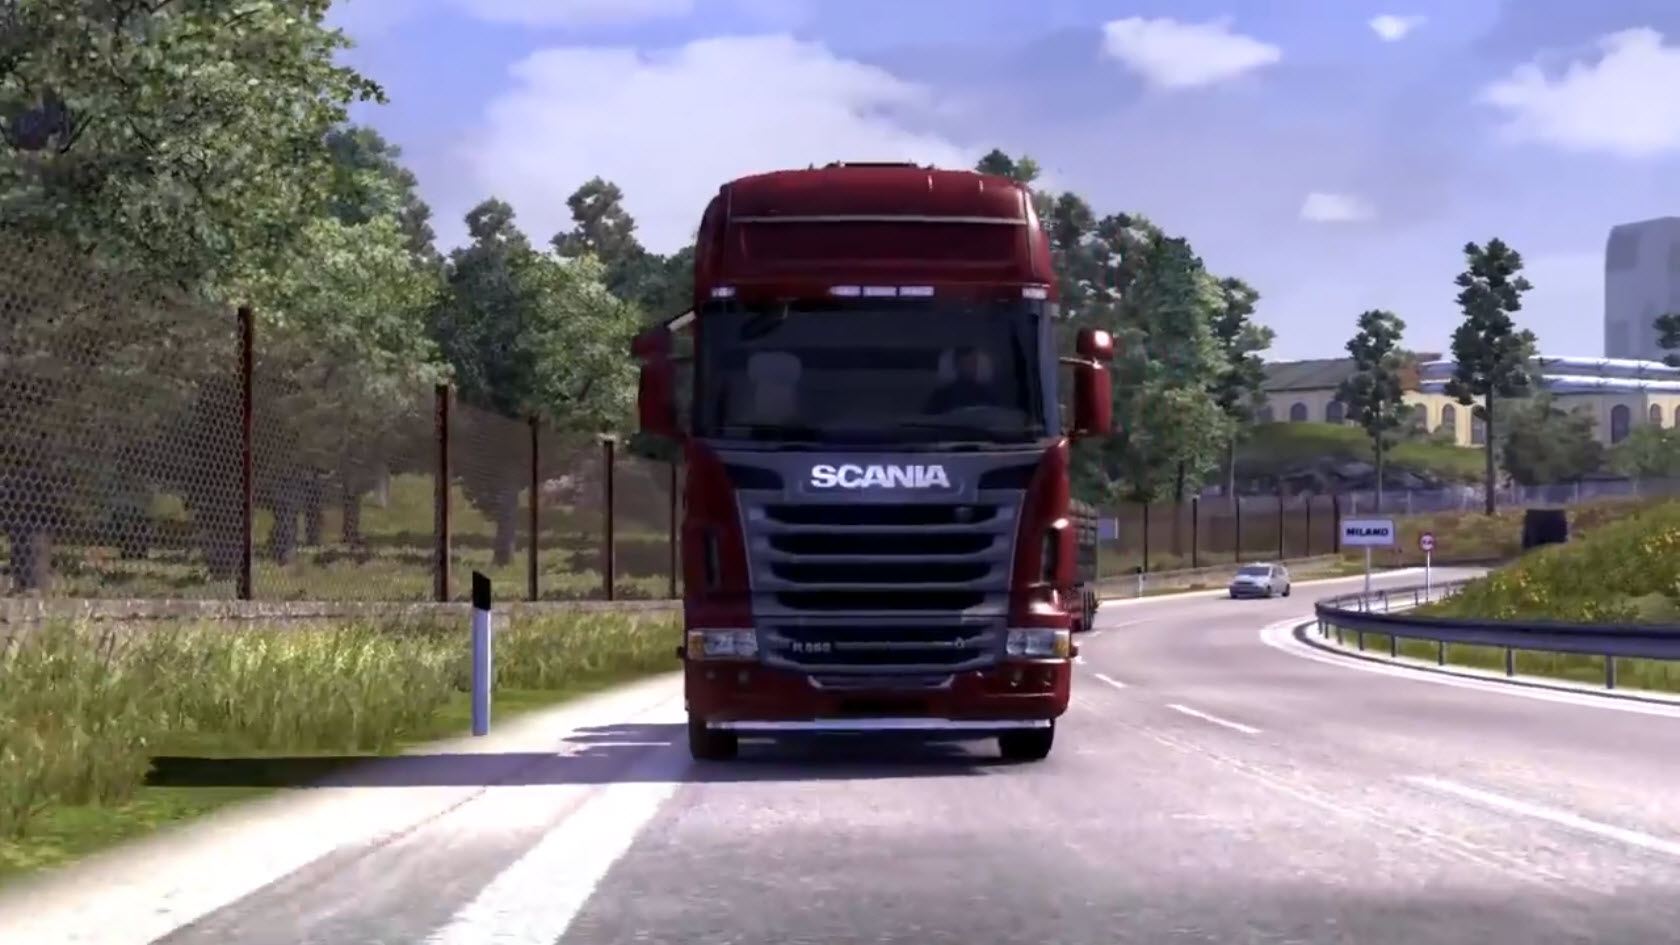 Euro Truck Simulator 2 update 1.9: nueva inteligencia artificial y soporte para Oculus Rift